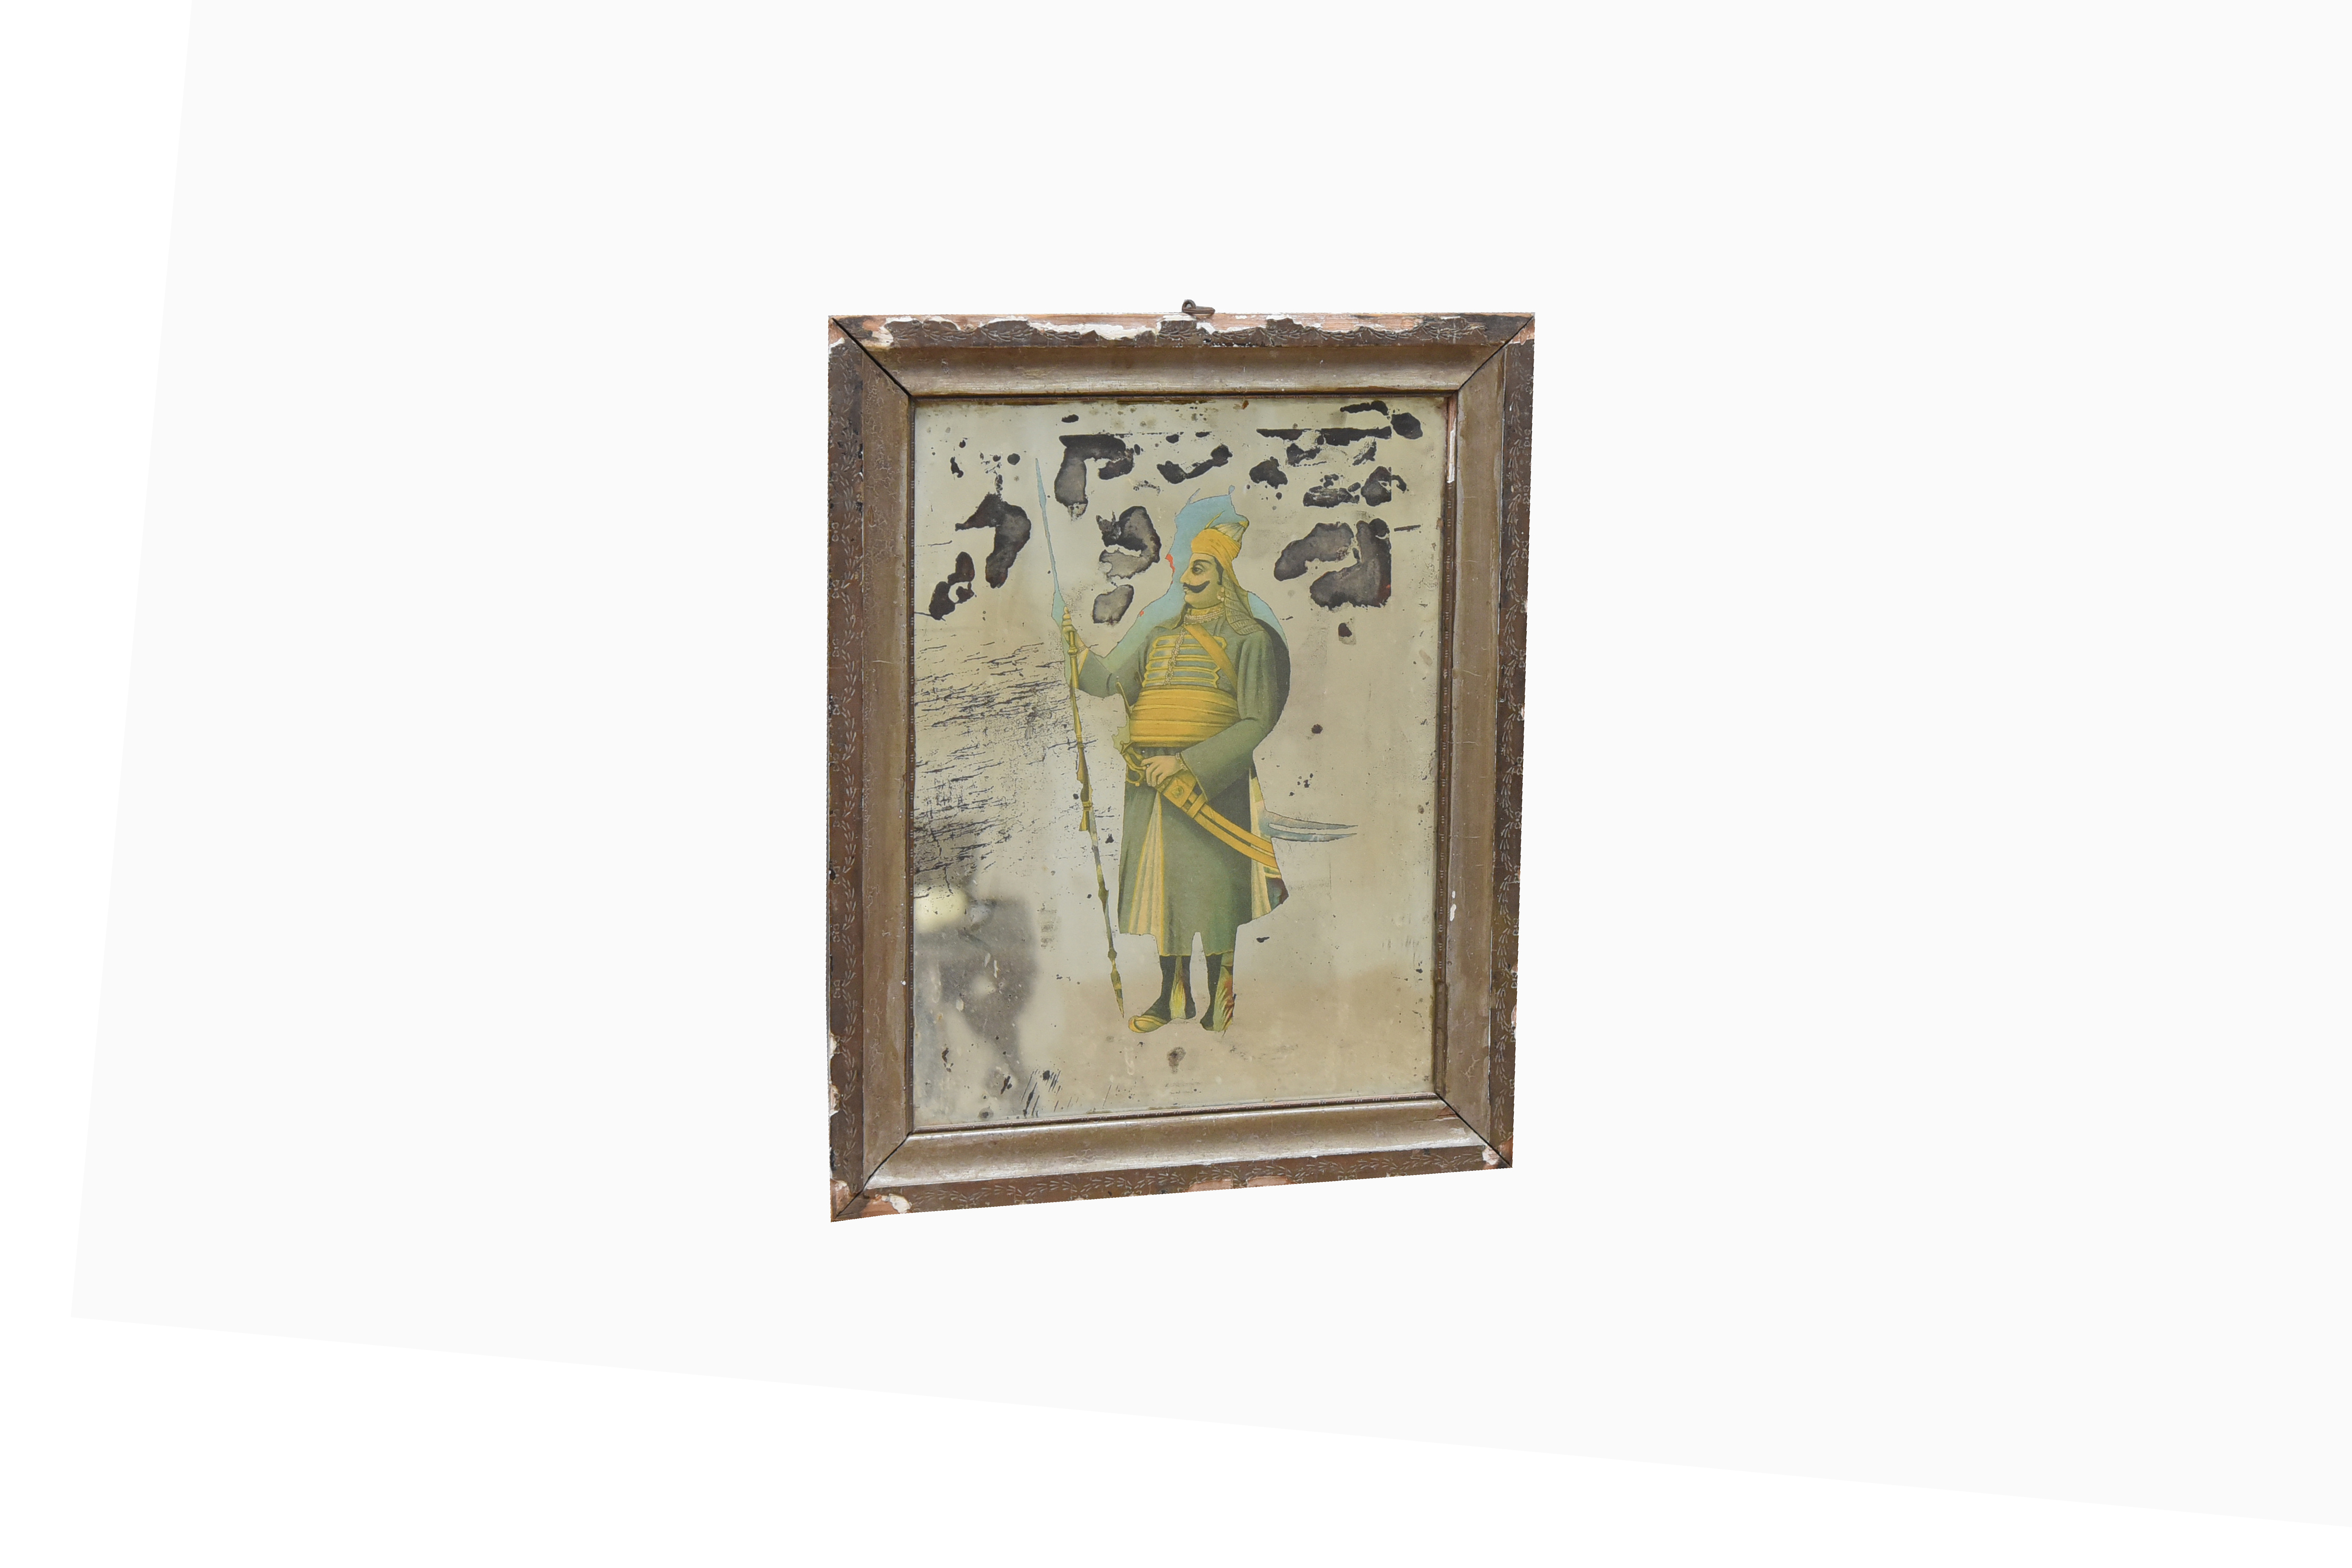 ANRA1865 - 40 x 2 x 50 cm